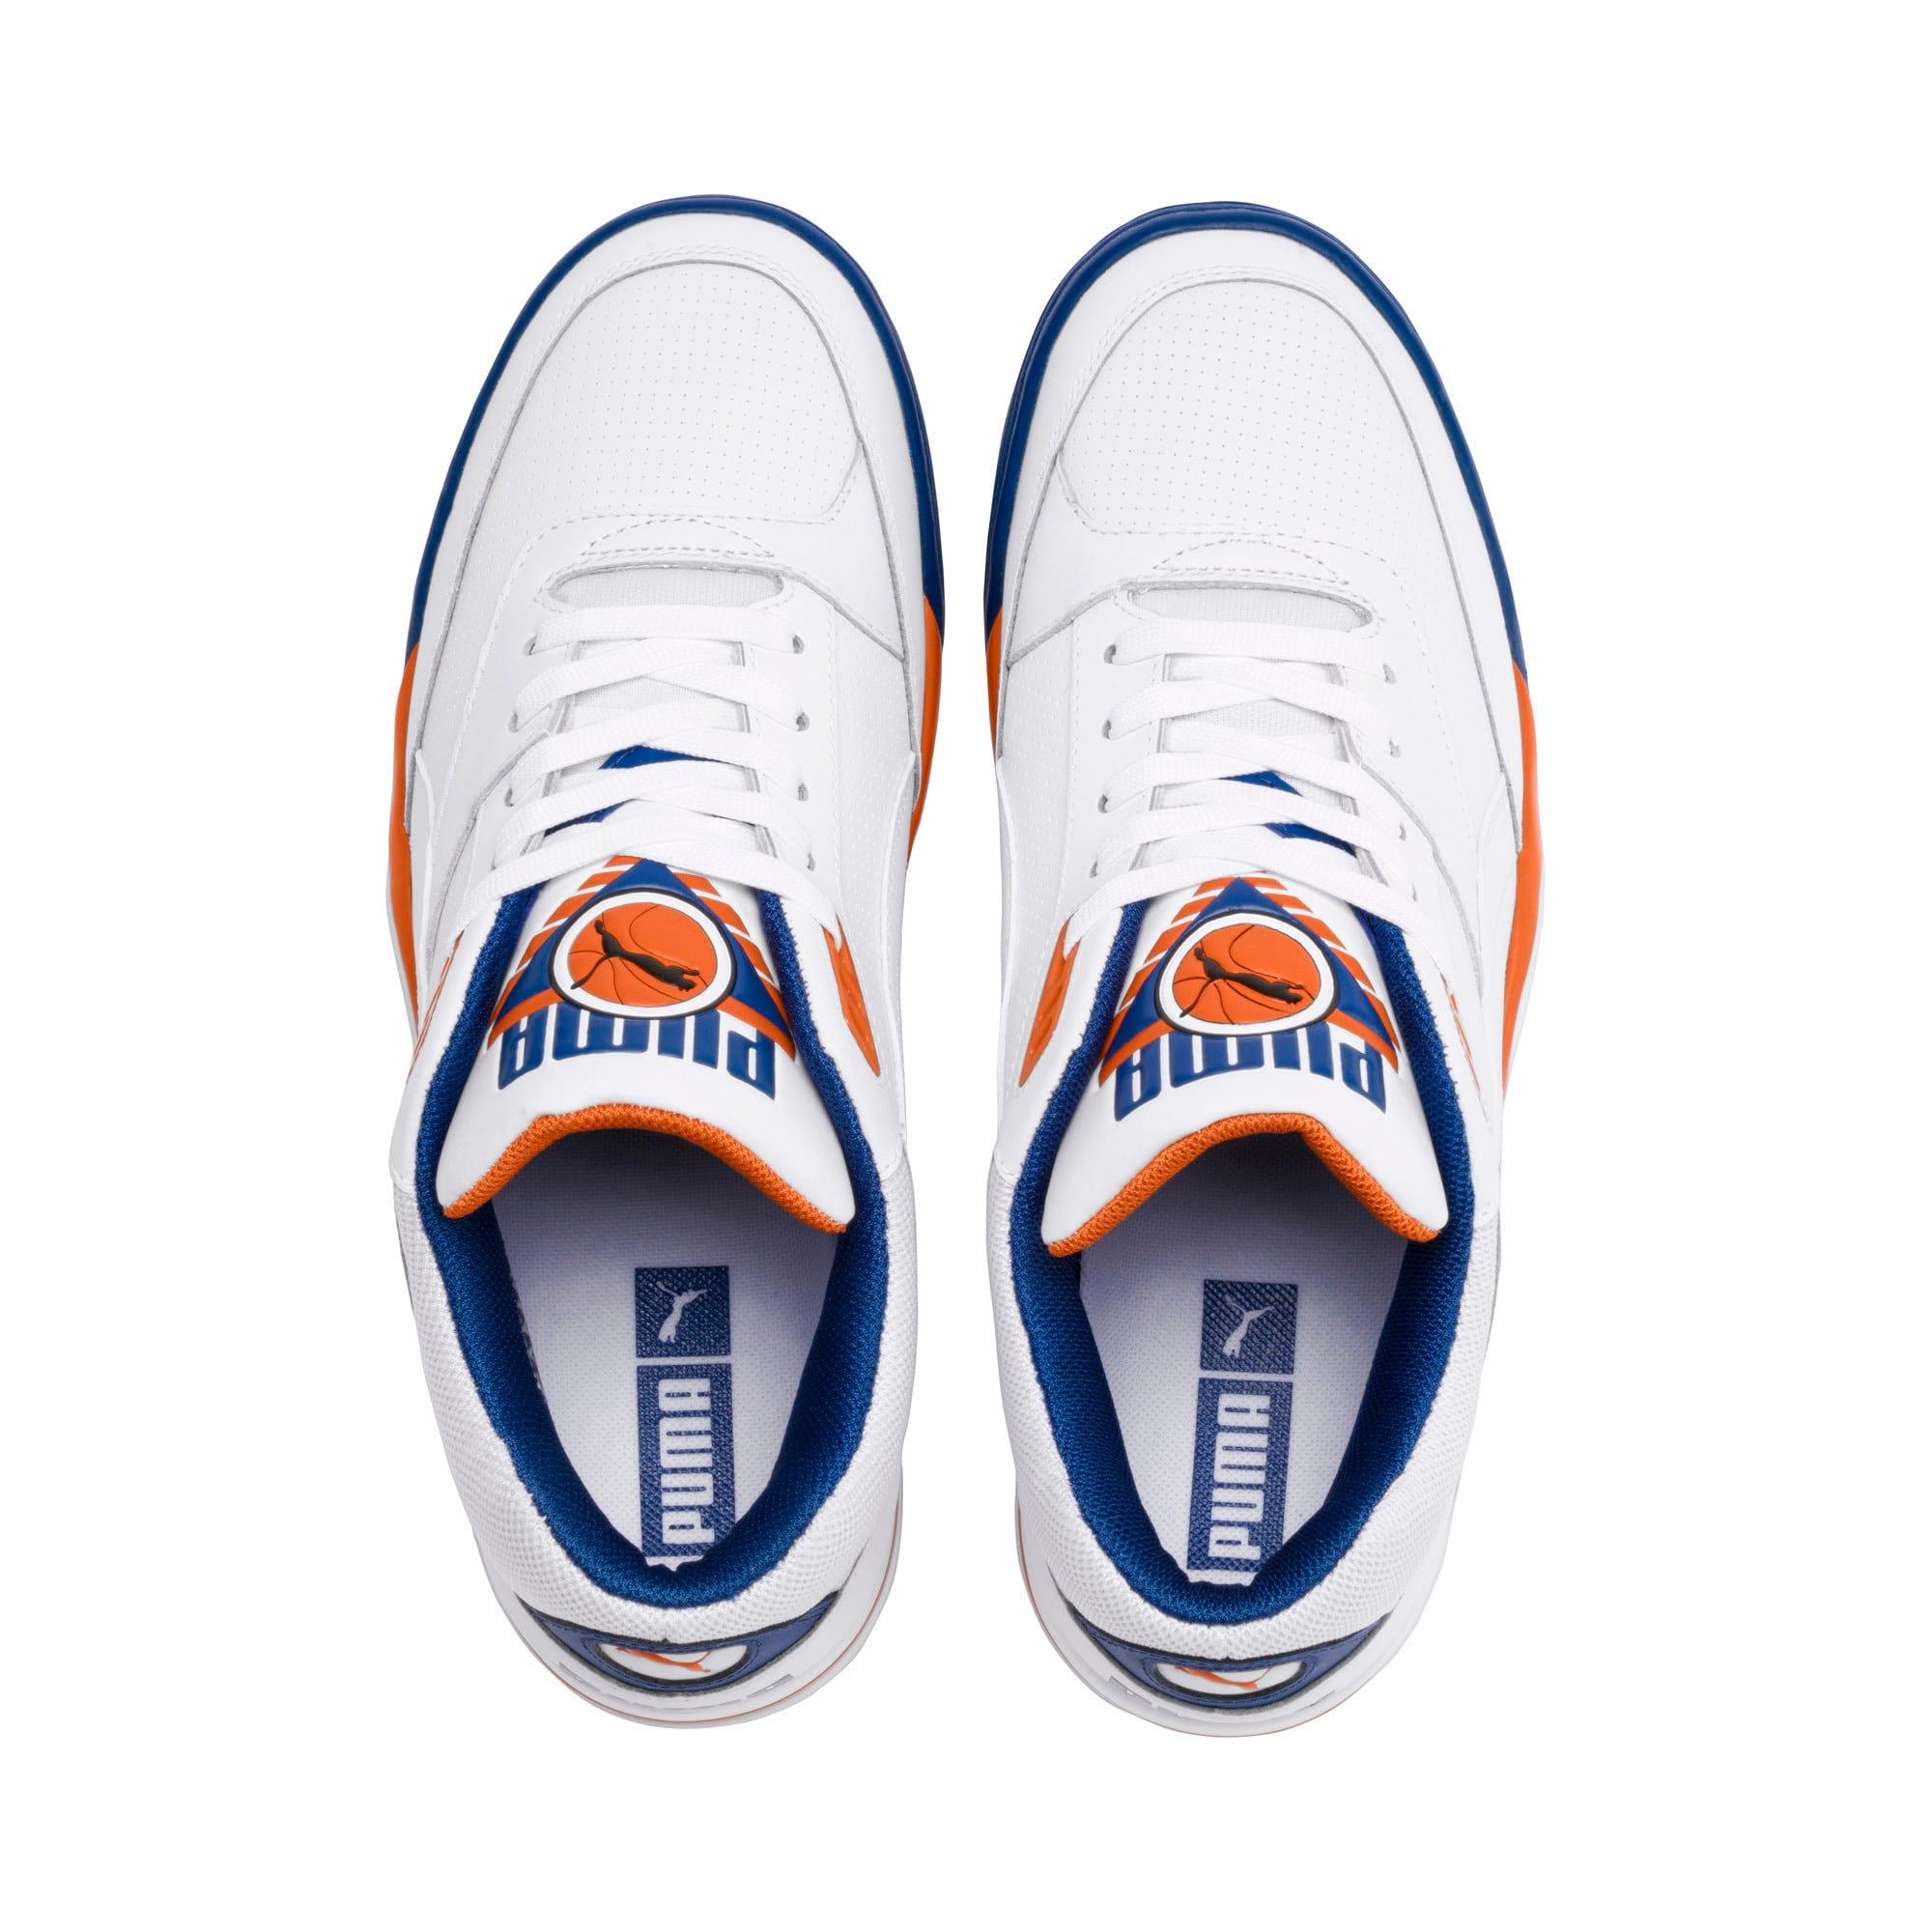 Thumbnail 6 of Palace Guard basketbalschoenen voor heren, P White-Jaffa Orange-G Blue, medium